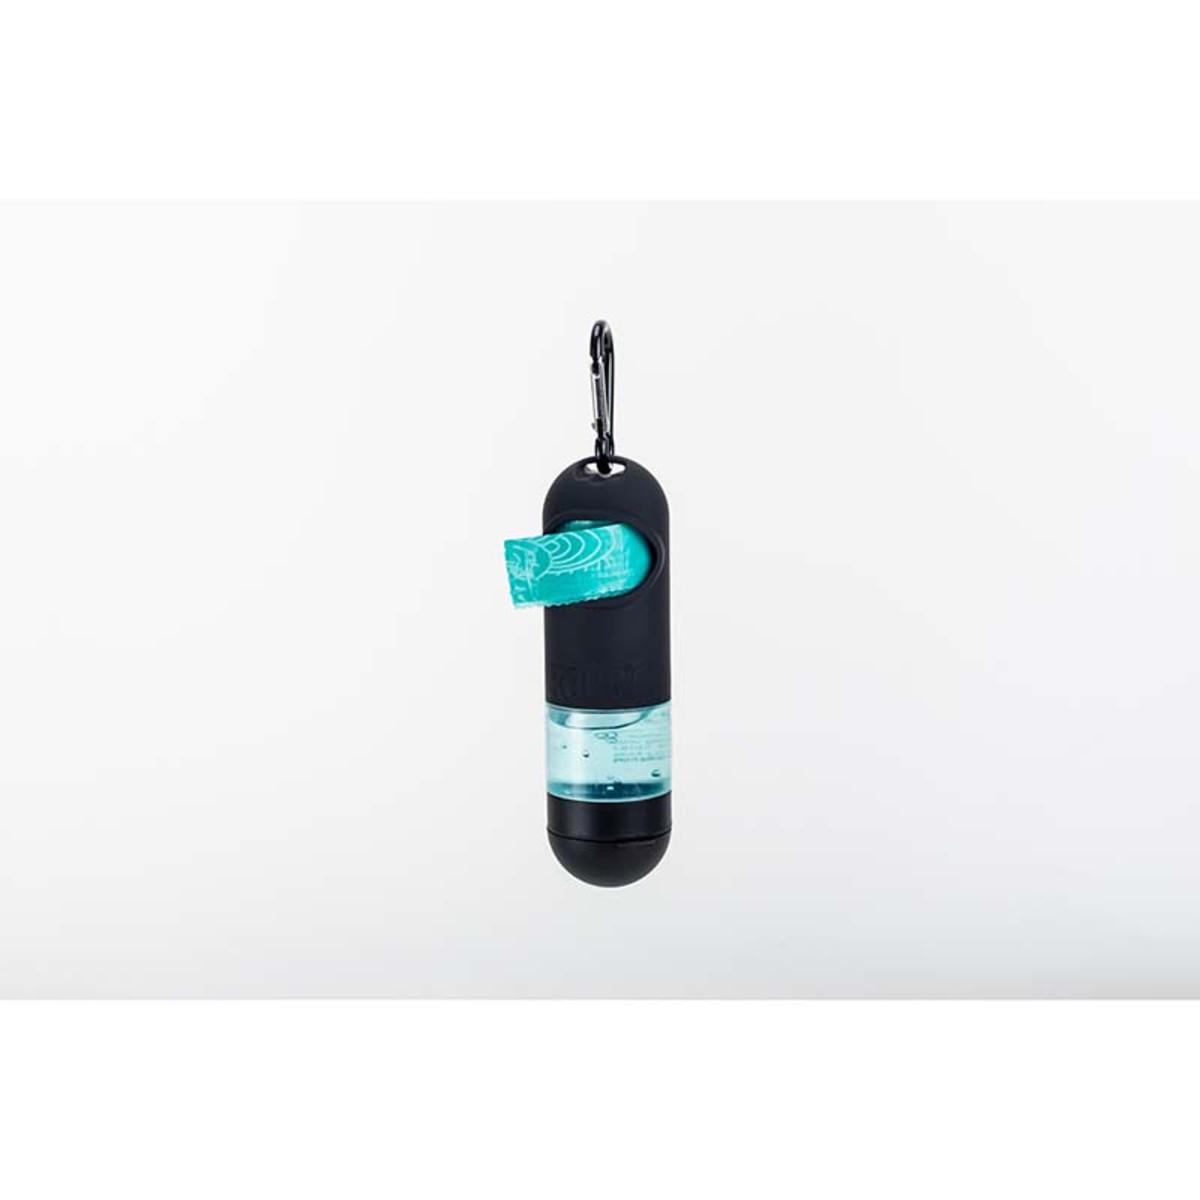 KONG HandiPOD Mini Clean Dispenser with Poop Bags